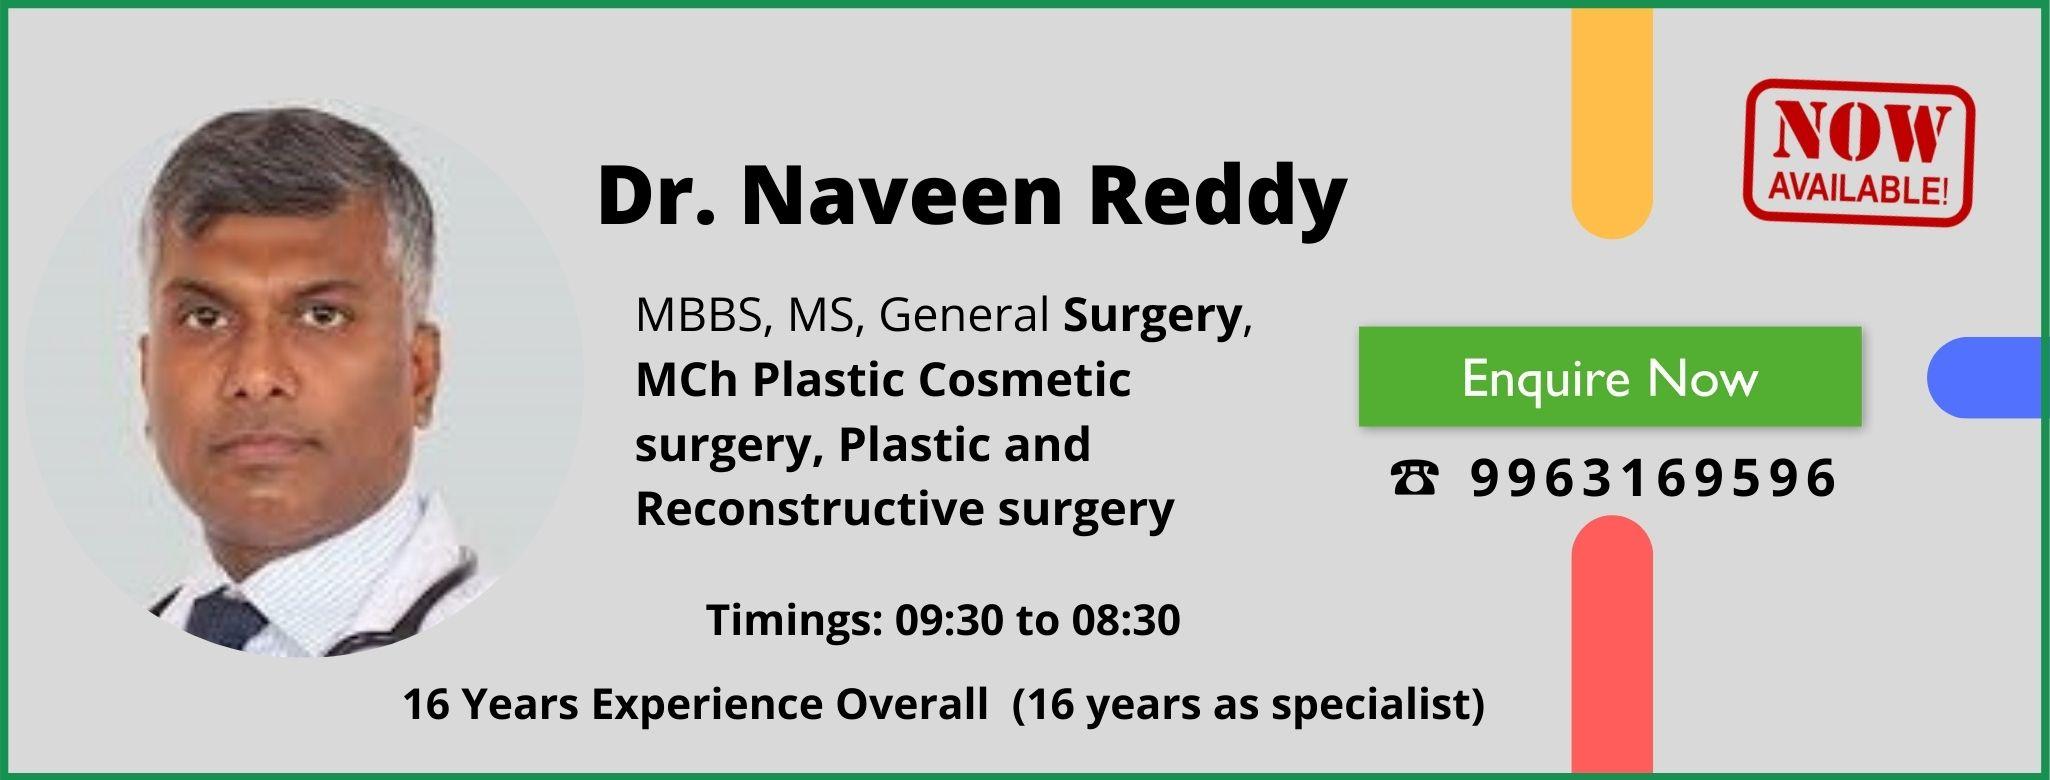 dr naveen reddy